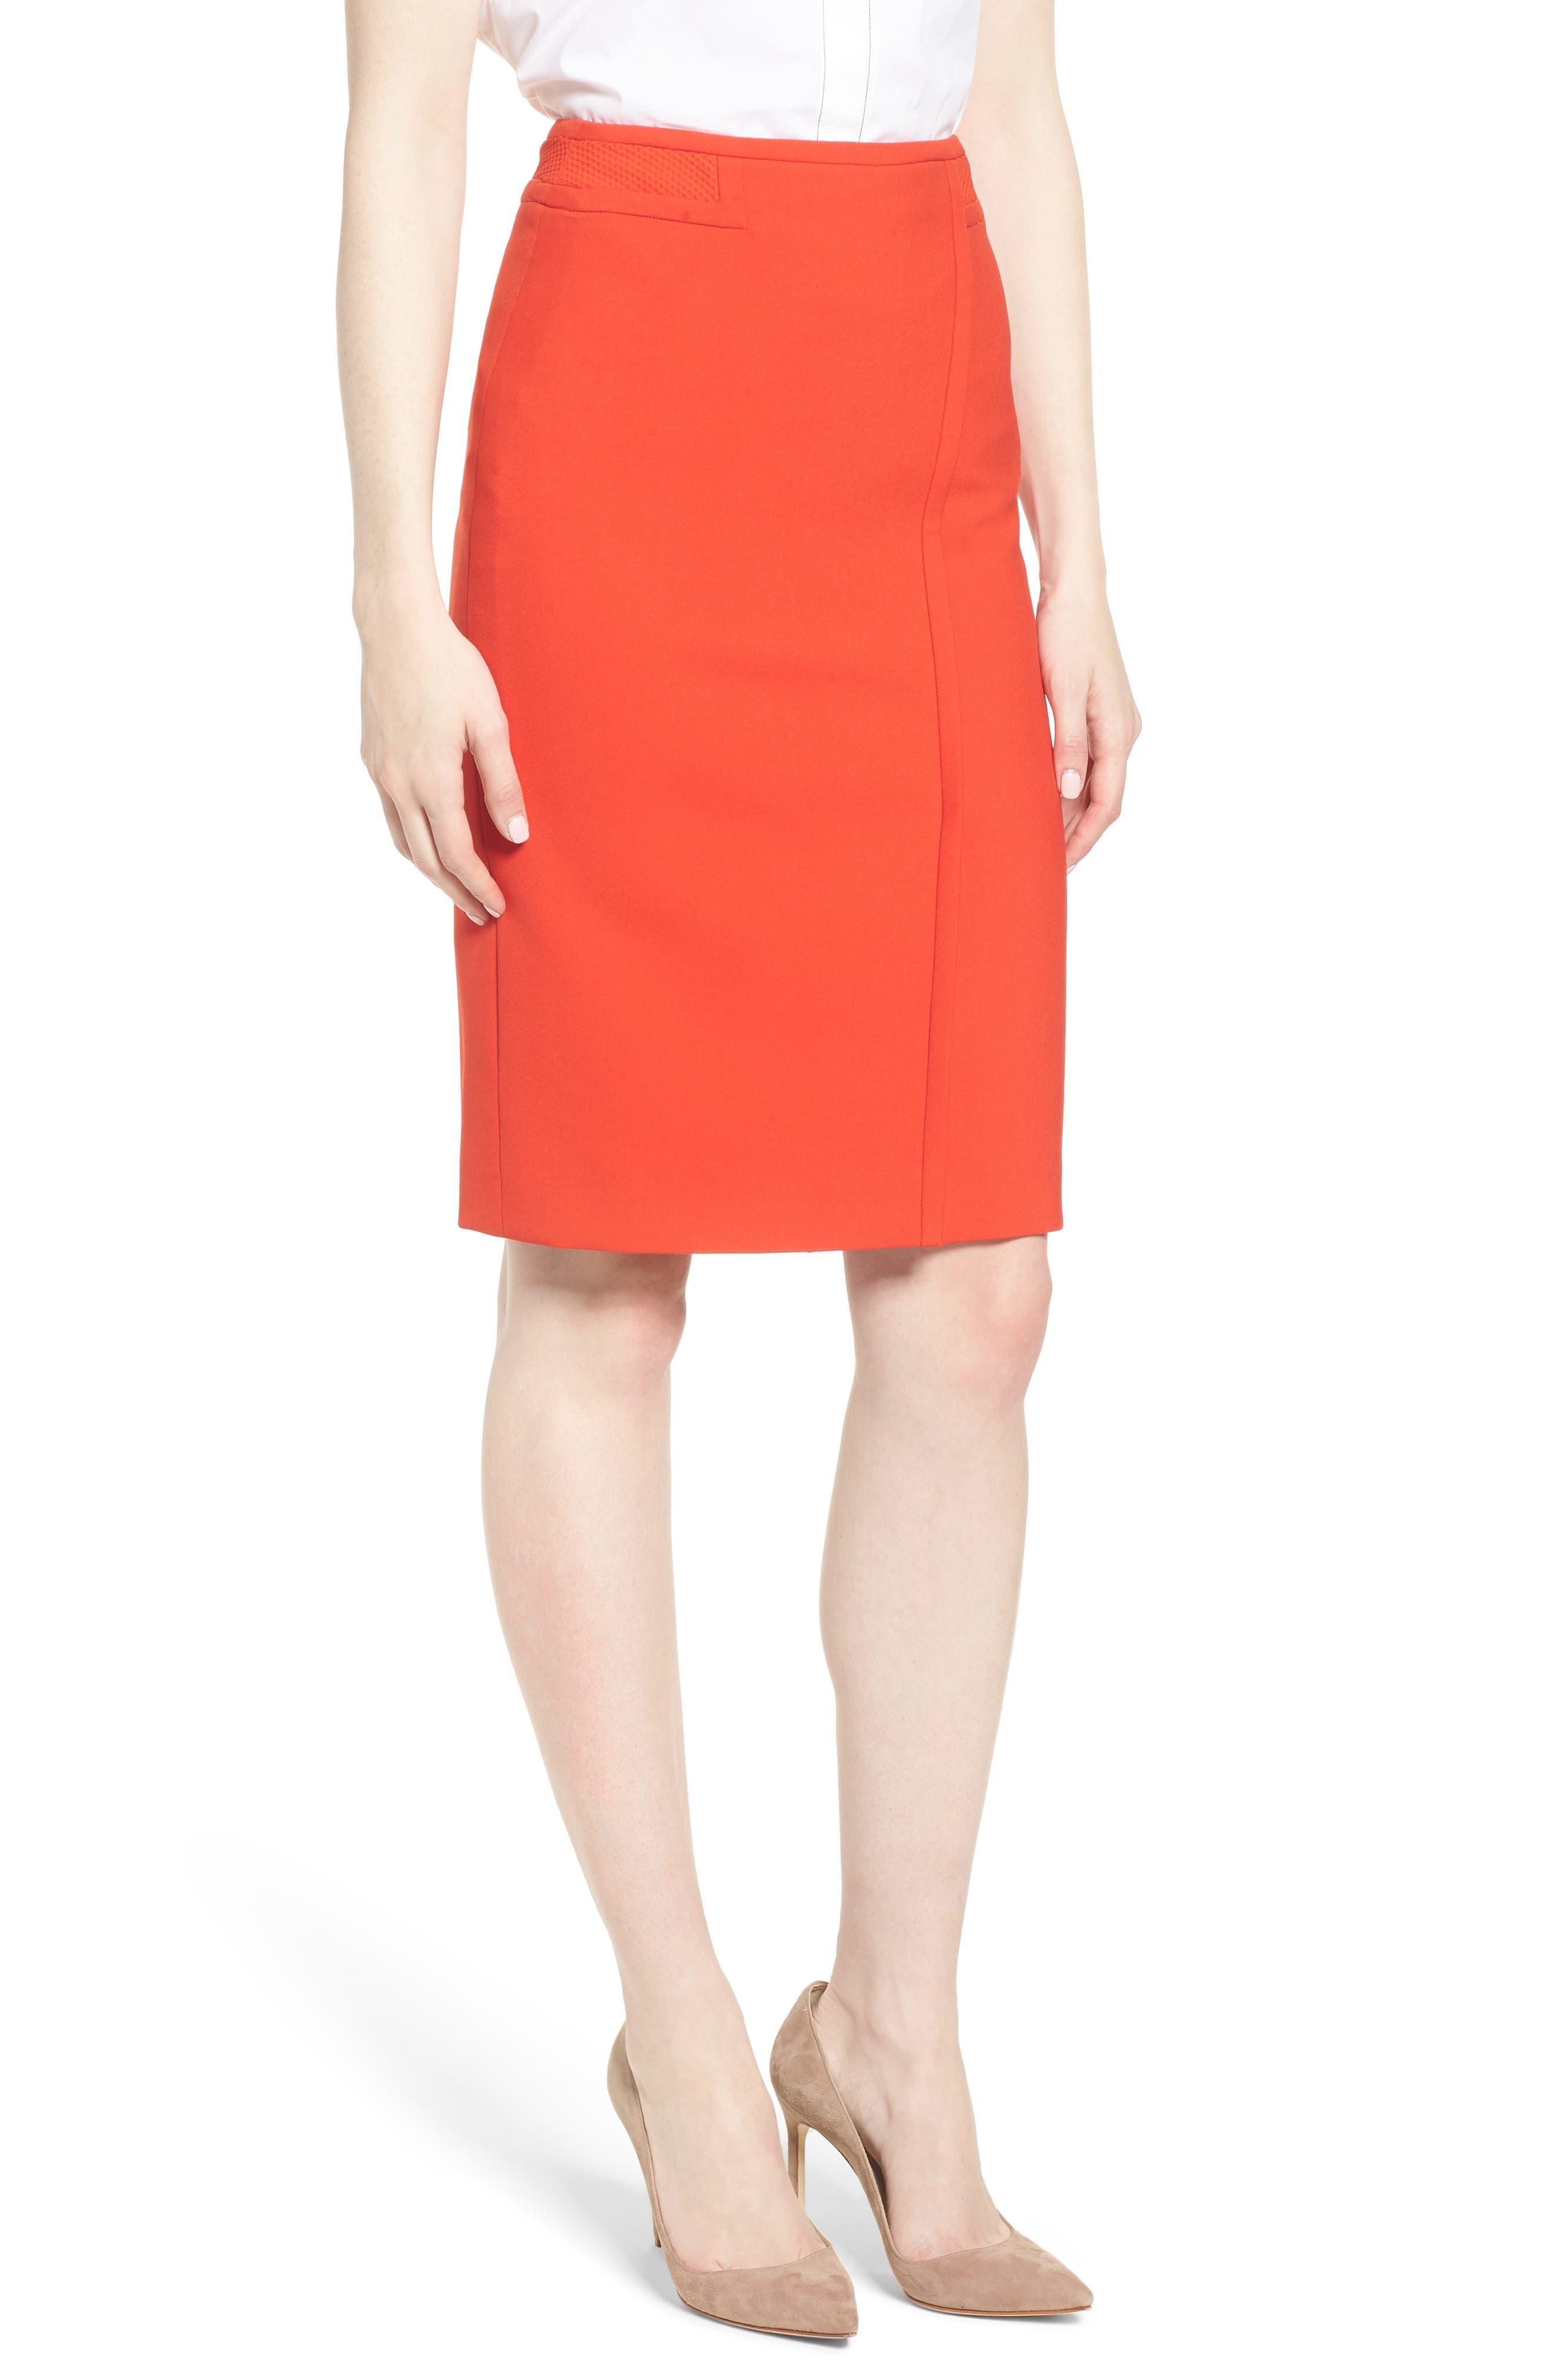 Vadama Ponte Pencil Skirt,                         Main,                         color,